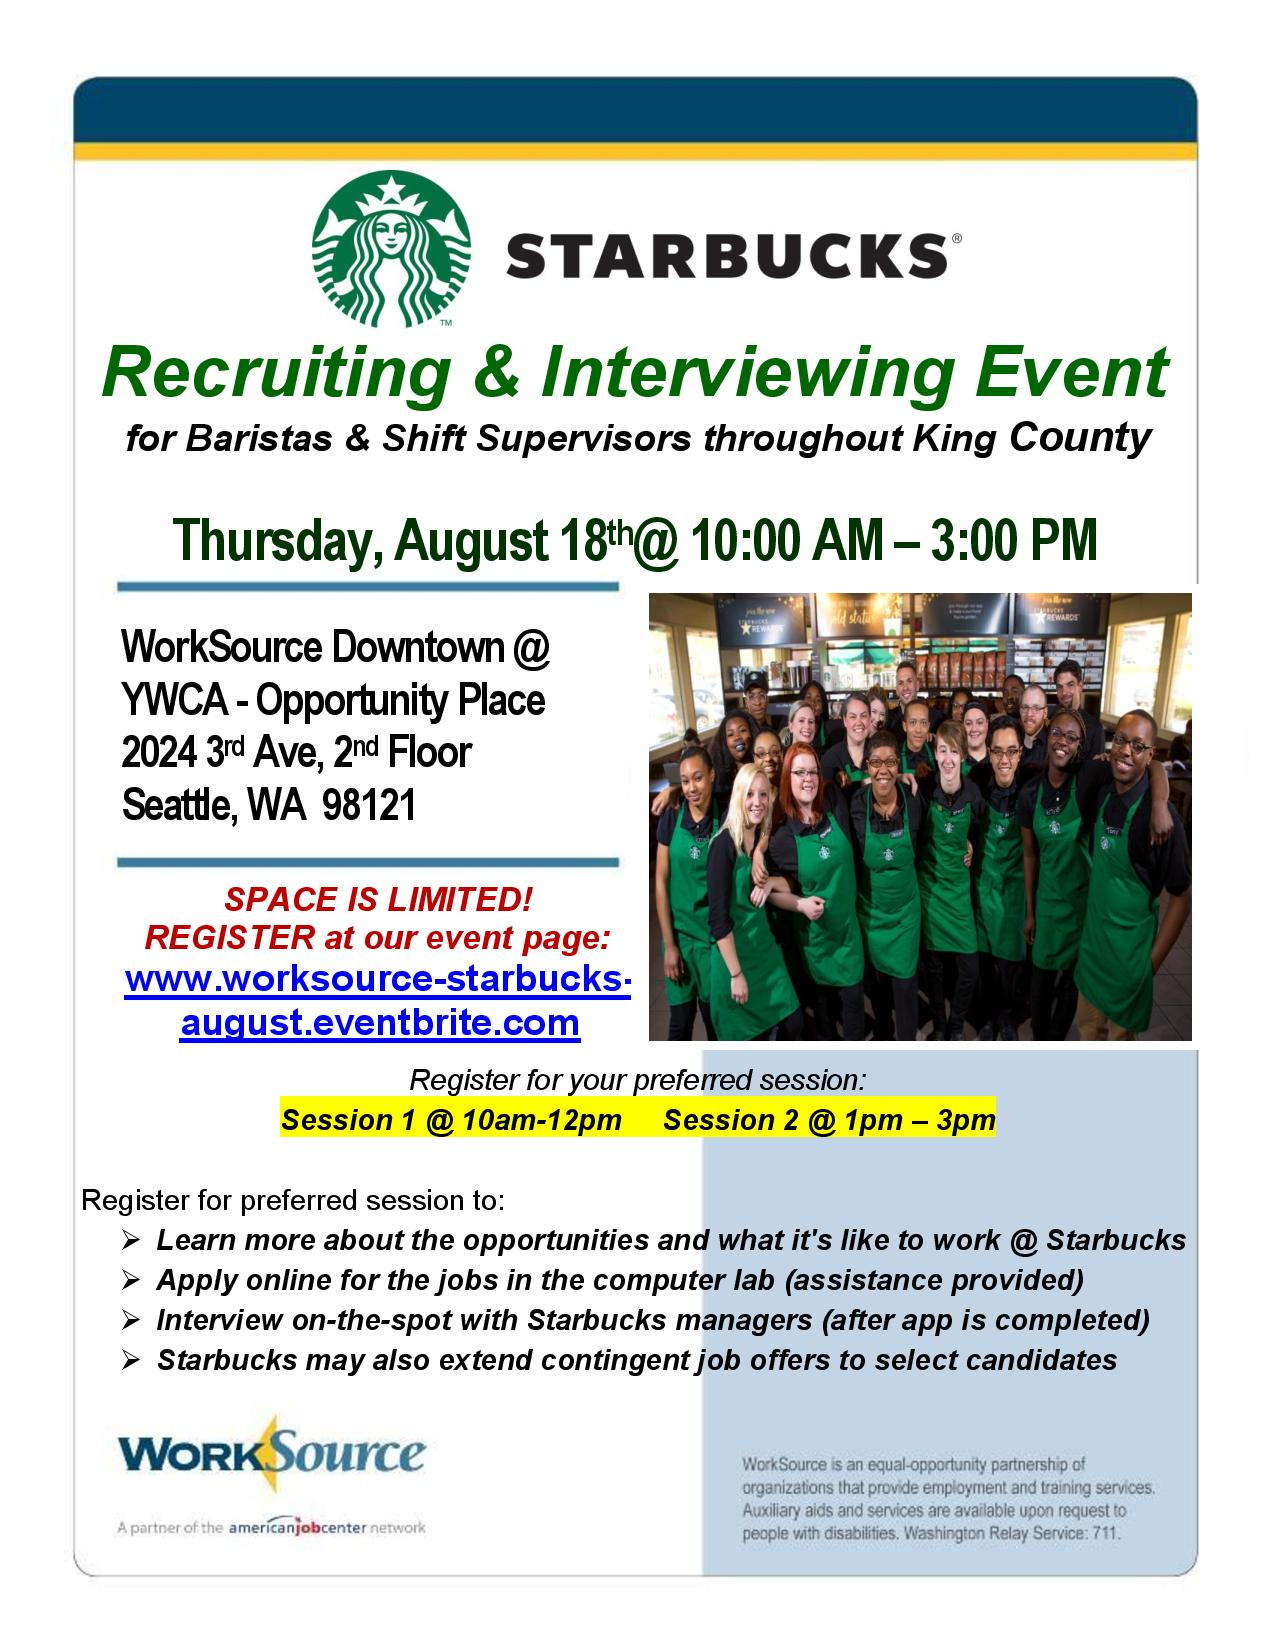 Starbucks Hiring Event Flyer